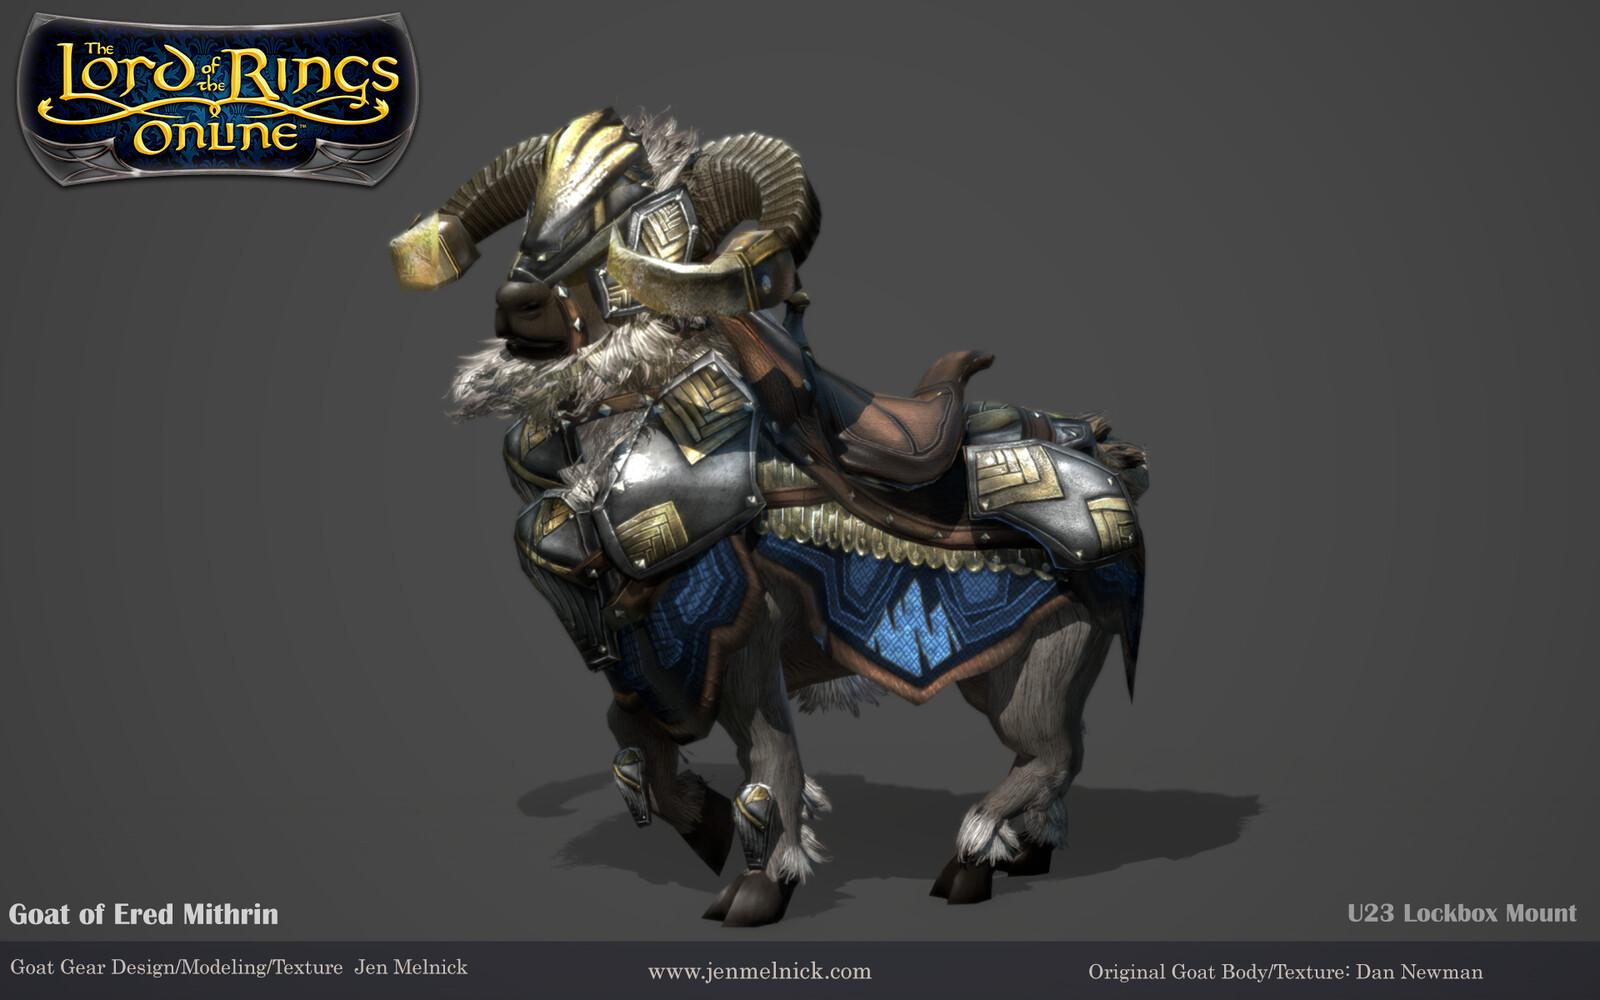 U23 Lockbox Mount Goat of Ered Mithrin Marmoset render